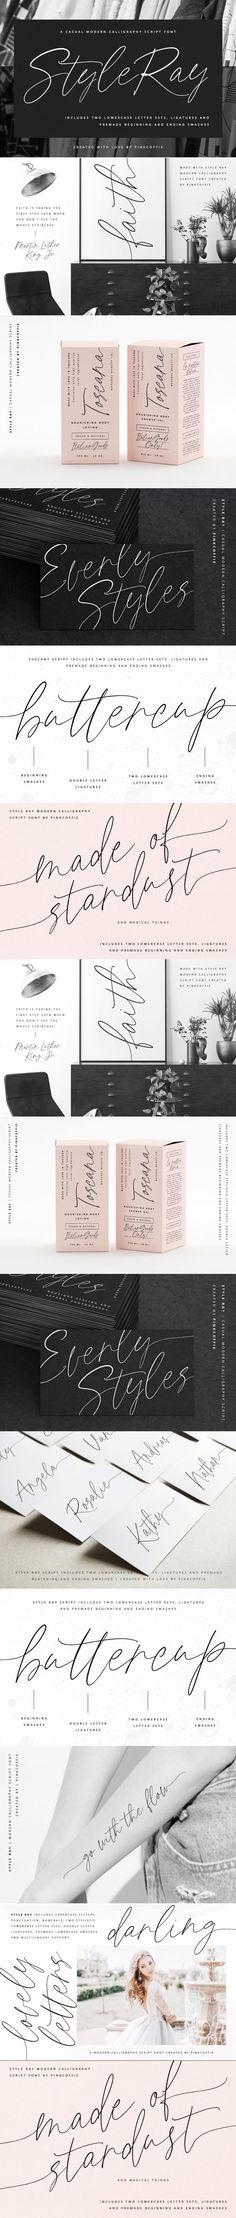 Style Ray Modern Calligraphy Script #truetype #woff #WeddingFonts #otf #calligraphyfont #handletteredfont #calligraphyscript #swashesfont #ttf #swashesfont #savethedate #brandingfont #weddingfont #truetypefont #digitalfont #packaging #script #modernscript #woff Best Script Fonts, Ttf Fonts, Cursive Fonts, Calligraphy Fonts, Typography Fonts, Cool Fonts, Modern Calligraphy, Typography Design, Script Alphabet